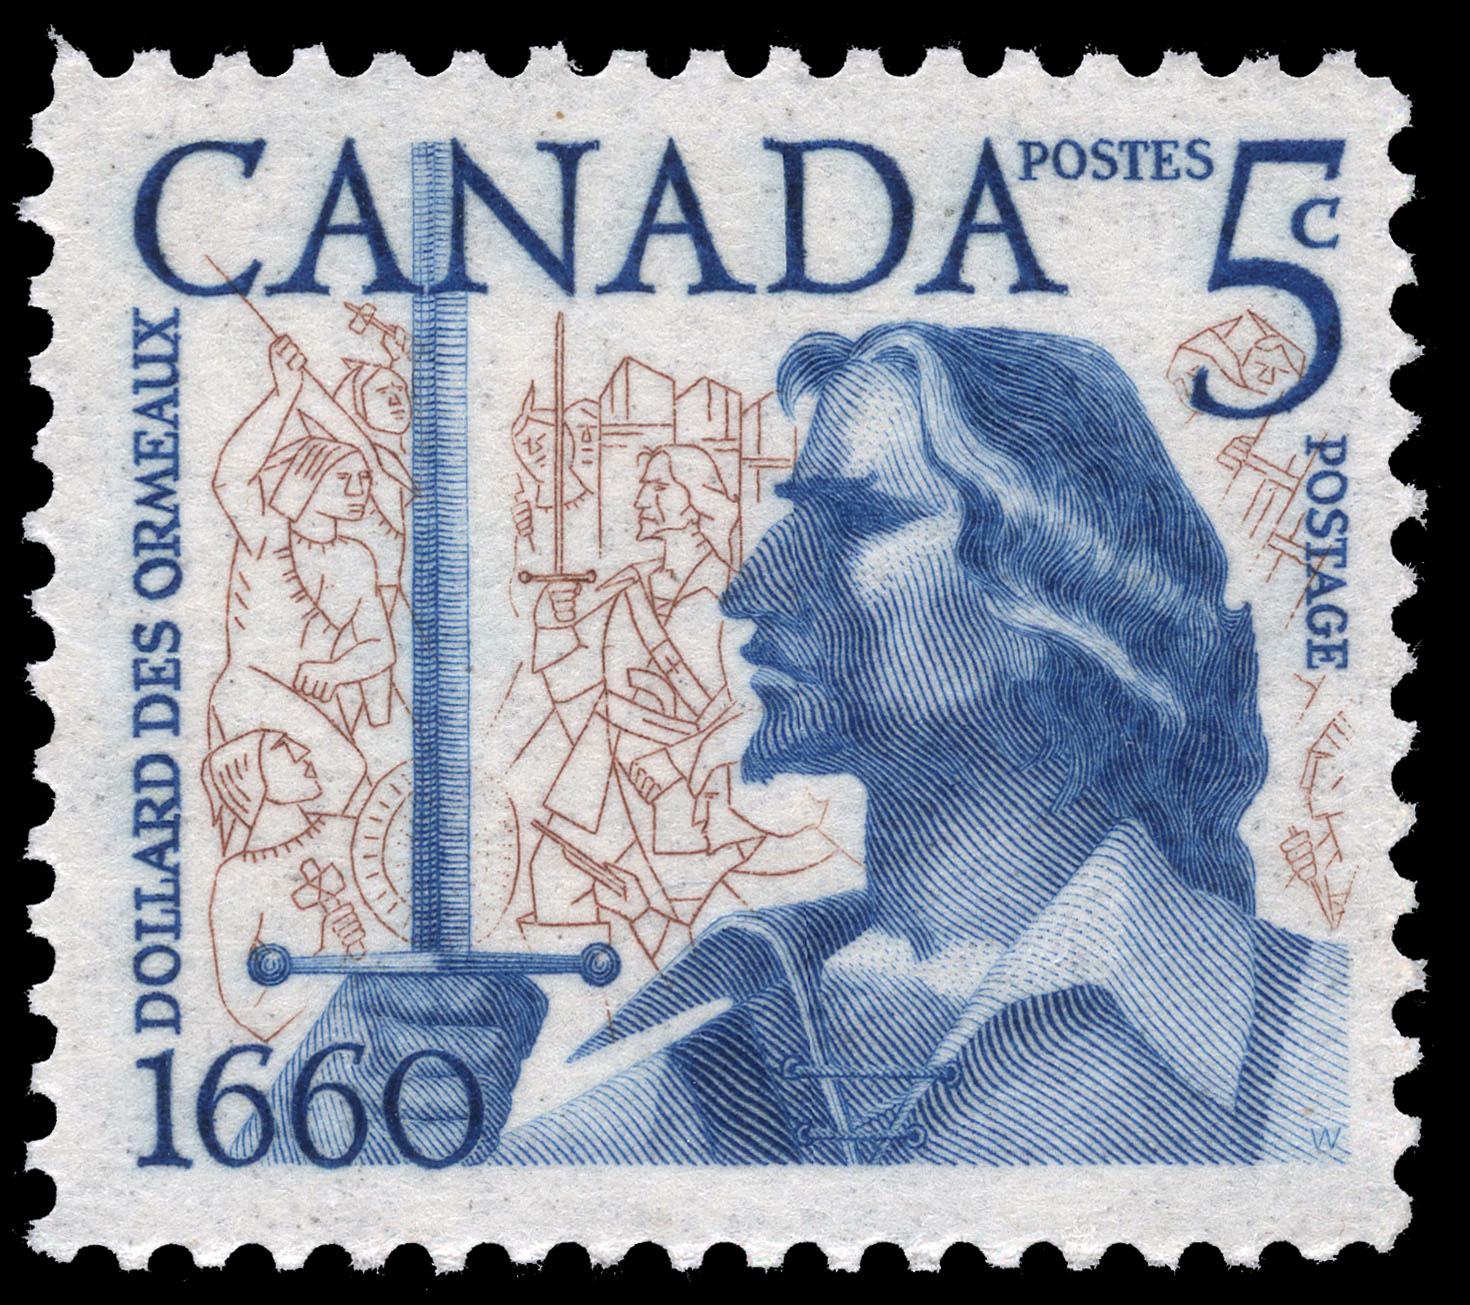 Dollard des Ormeaux, 1660 Canada Postage Stamp